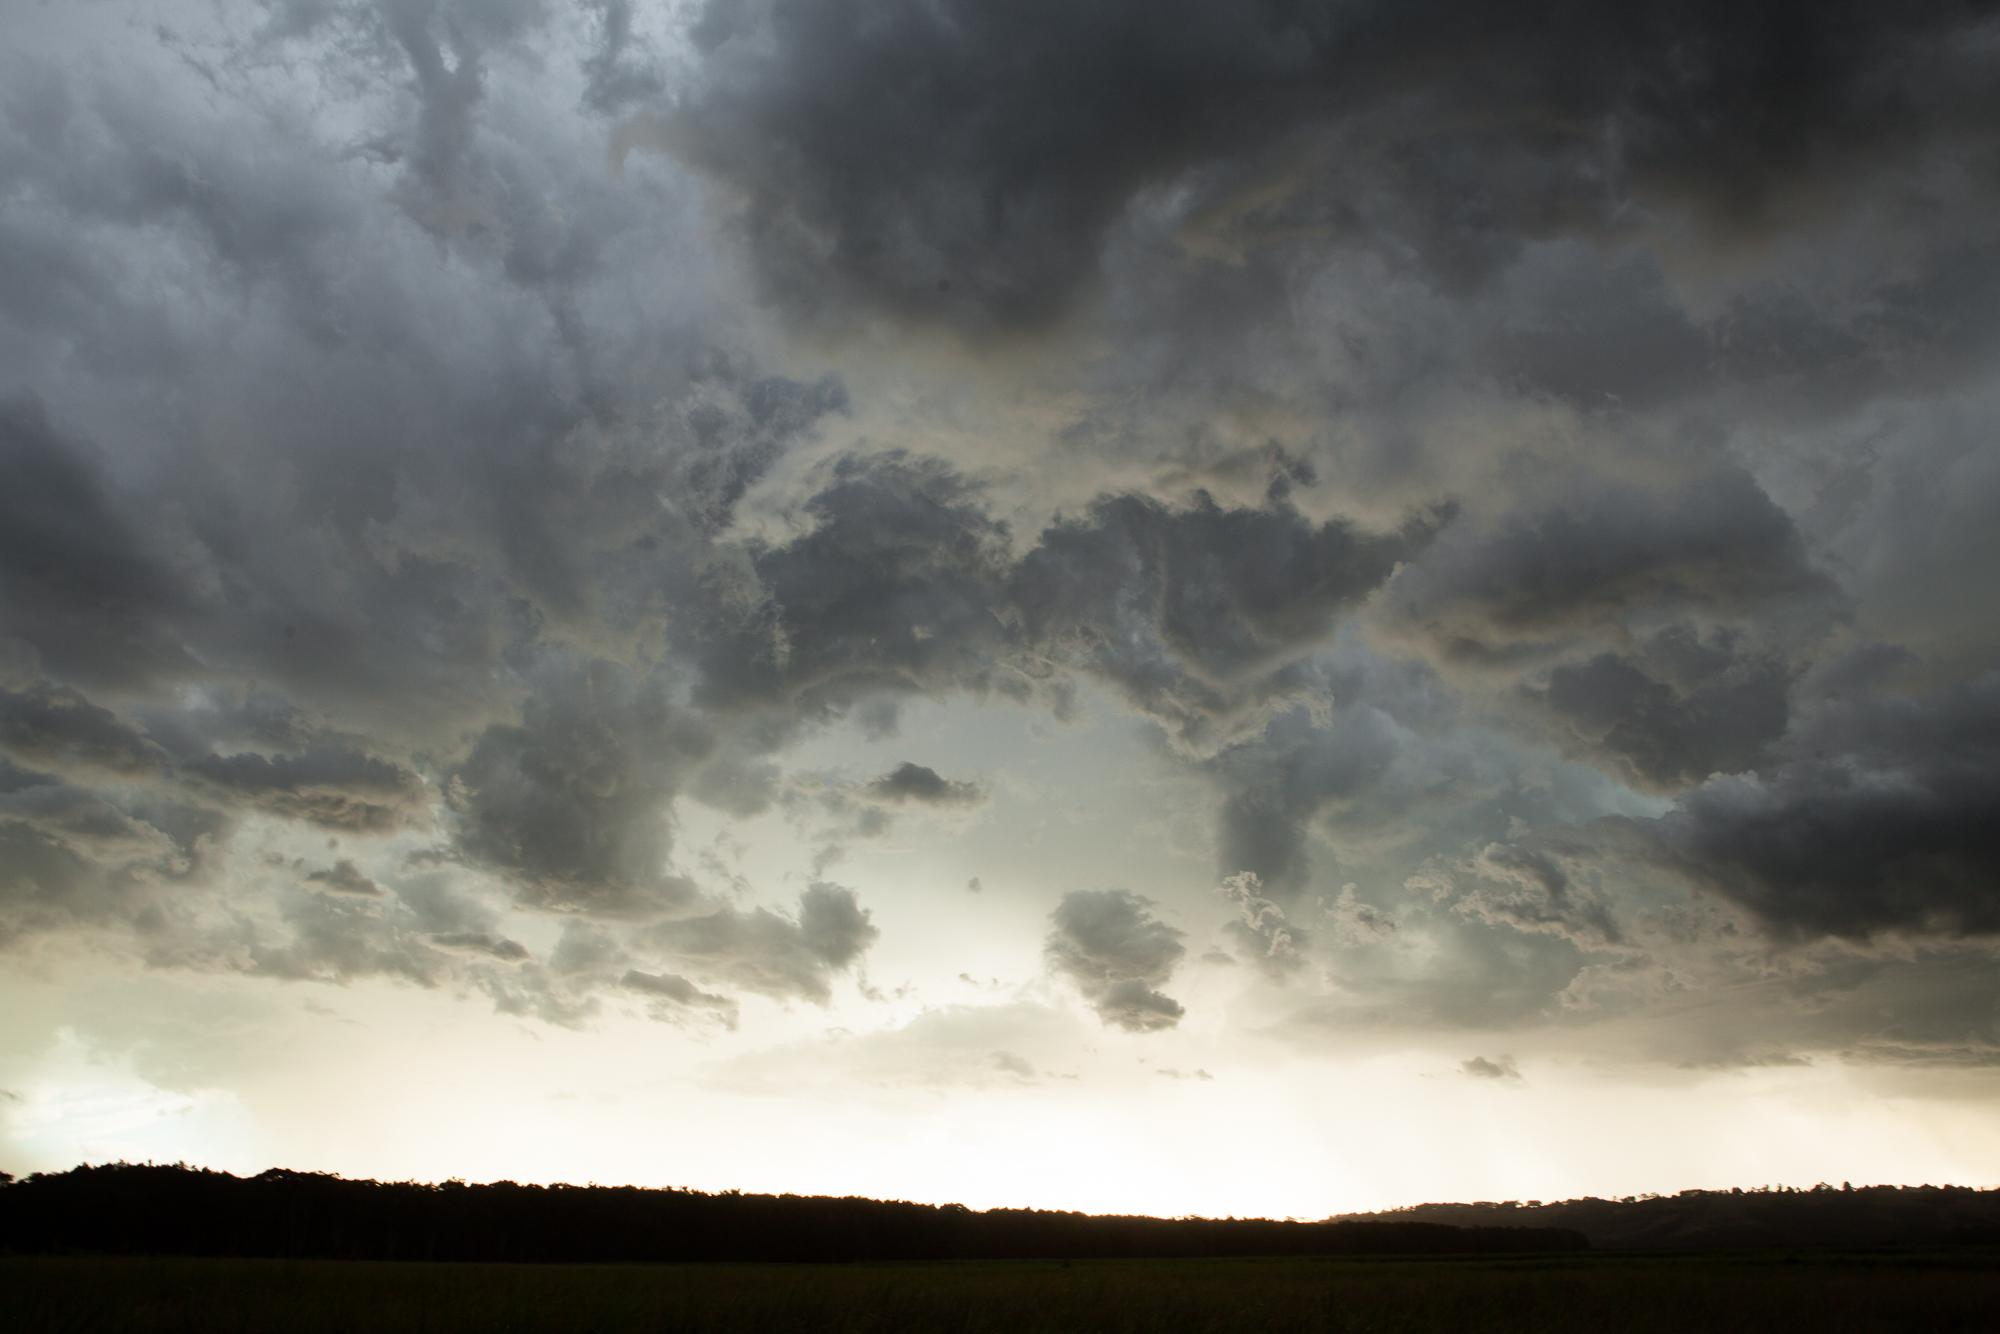 36-Bec_Kilpatrick_Photography_AustraliaIMG_4262